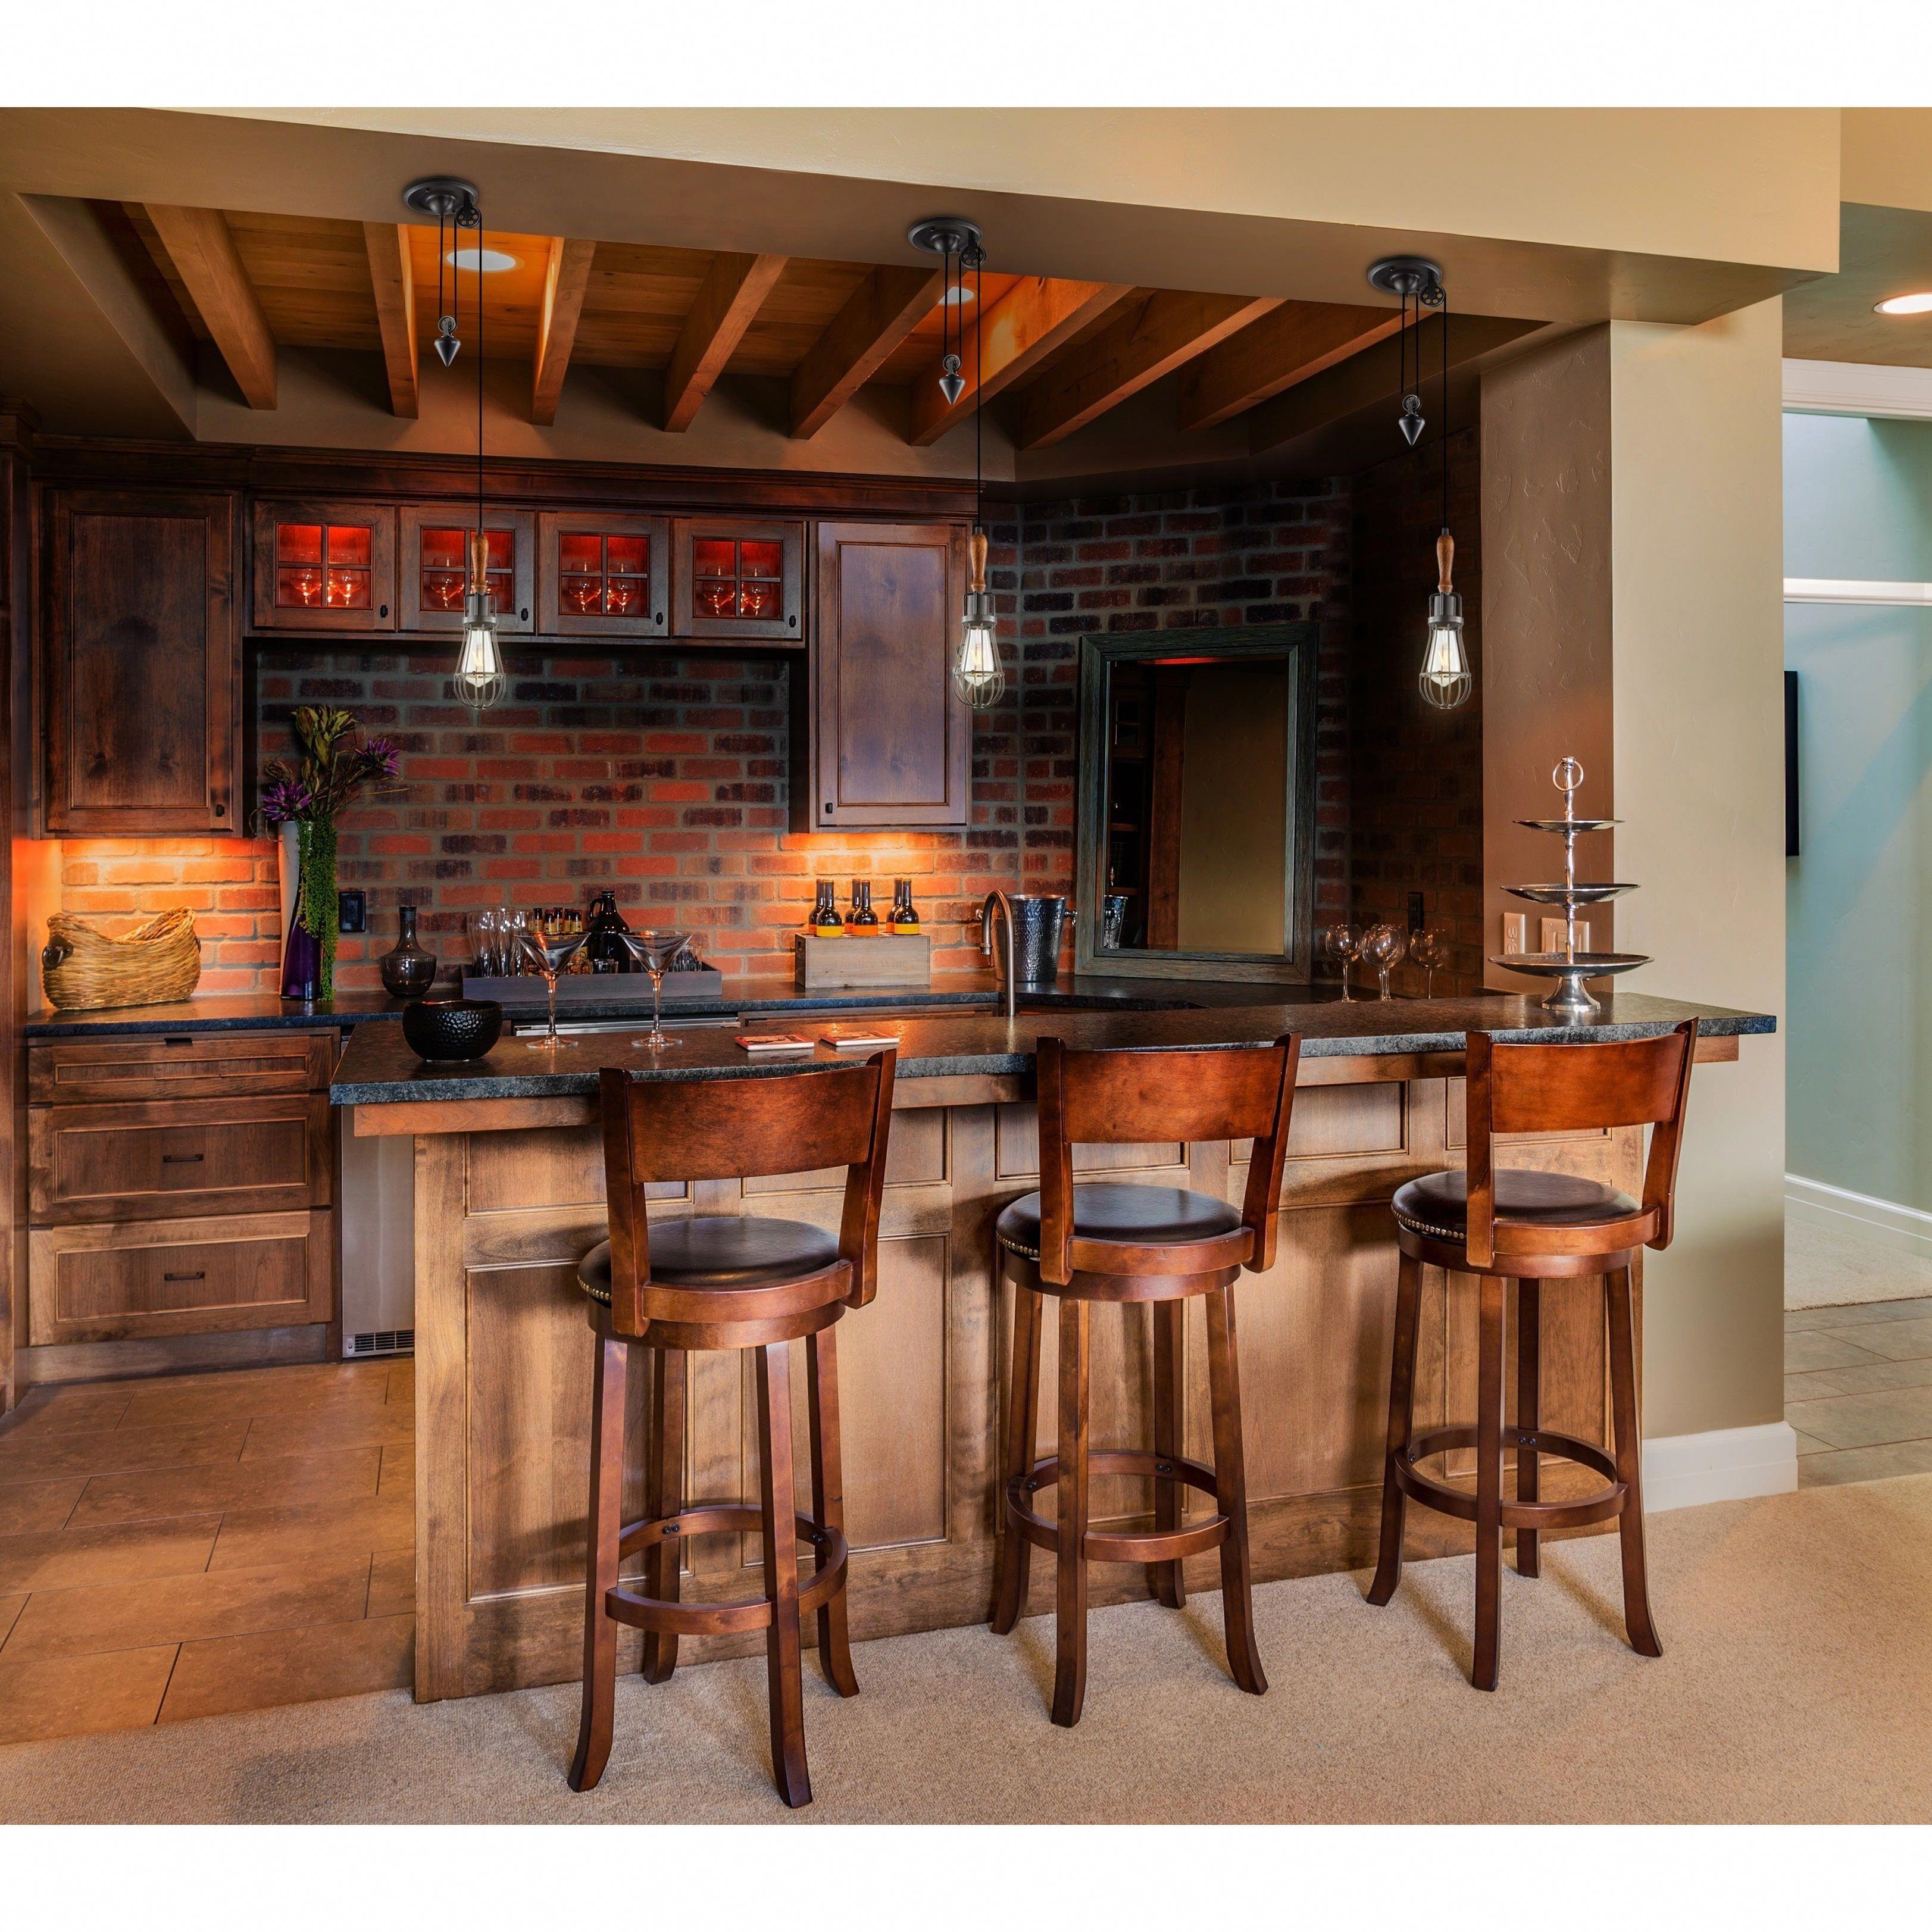 Home Design Basement Ideas: Basement Finishing Ideas In 2020